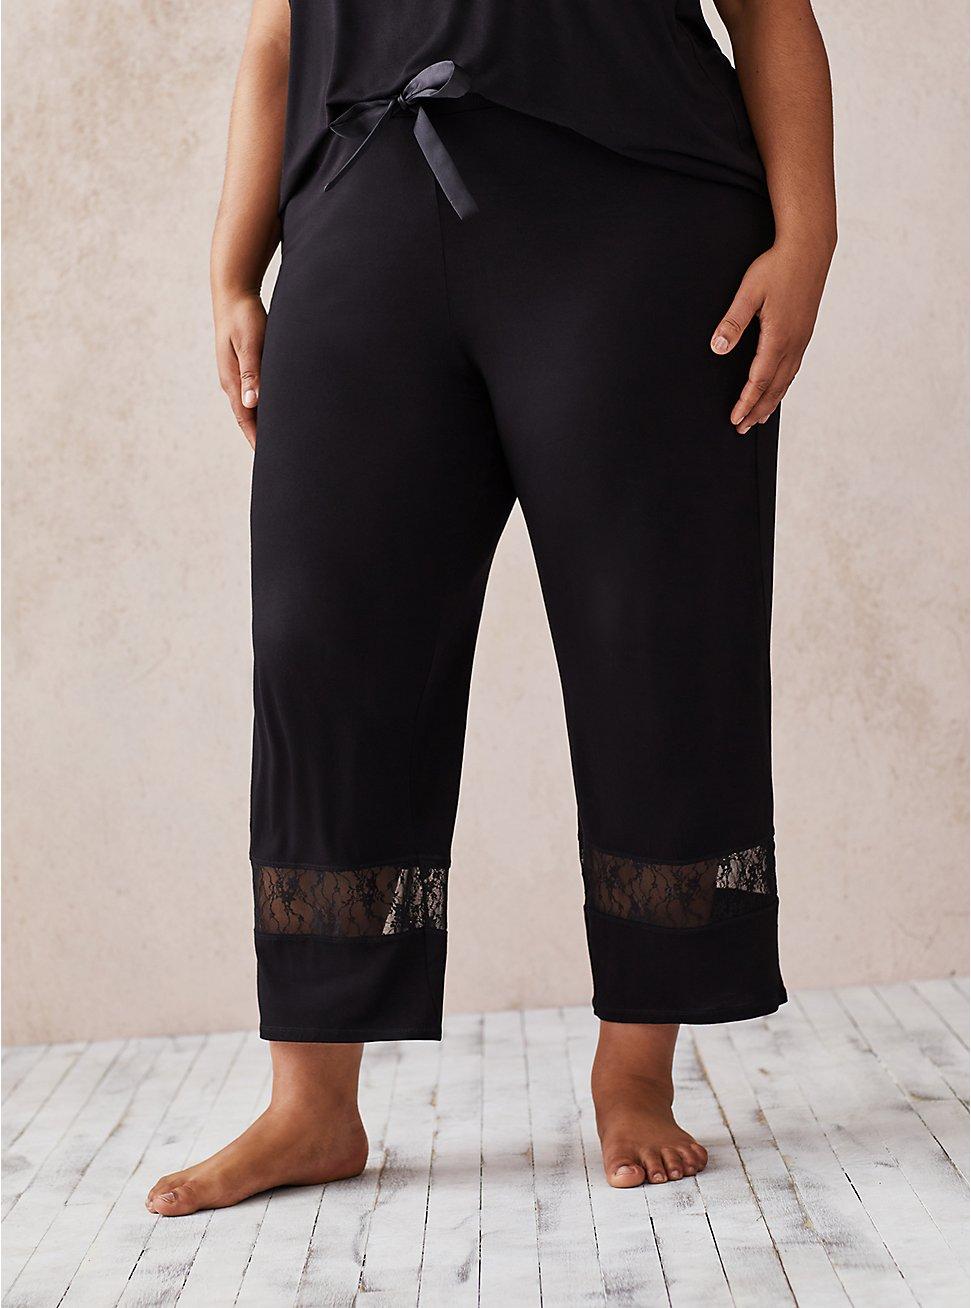 Black Super Soft Lace Inset Crop Sleep Pant, DEEP BLACK, hi-res